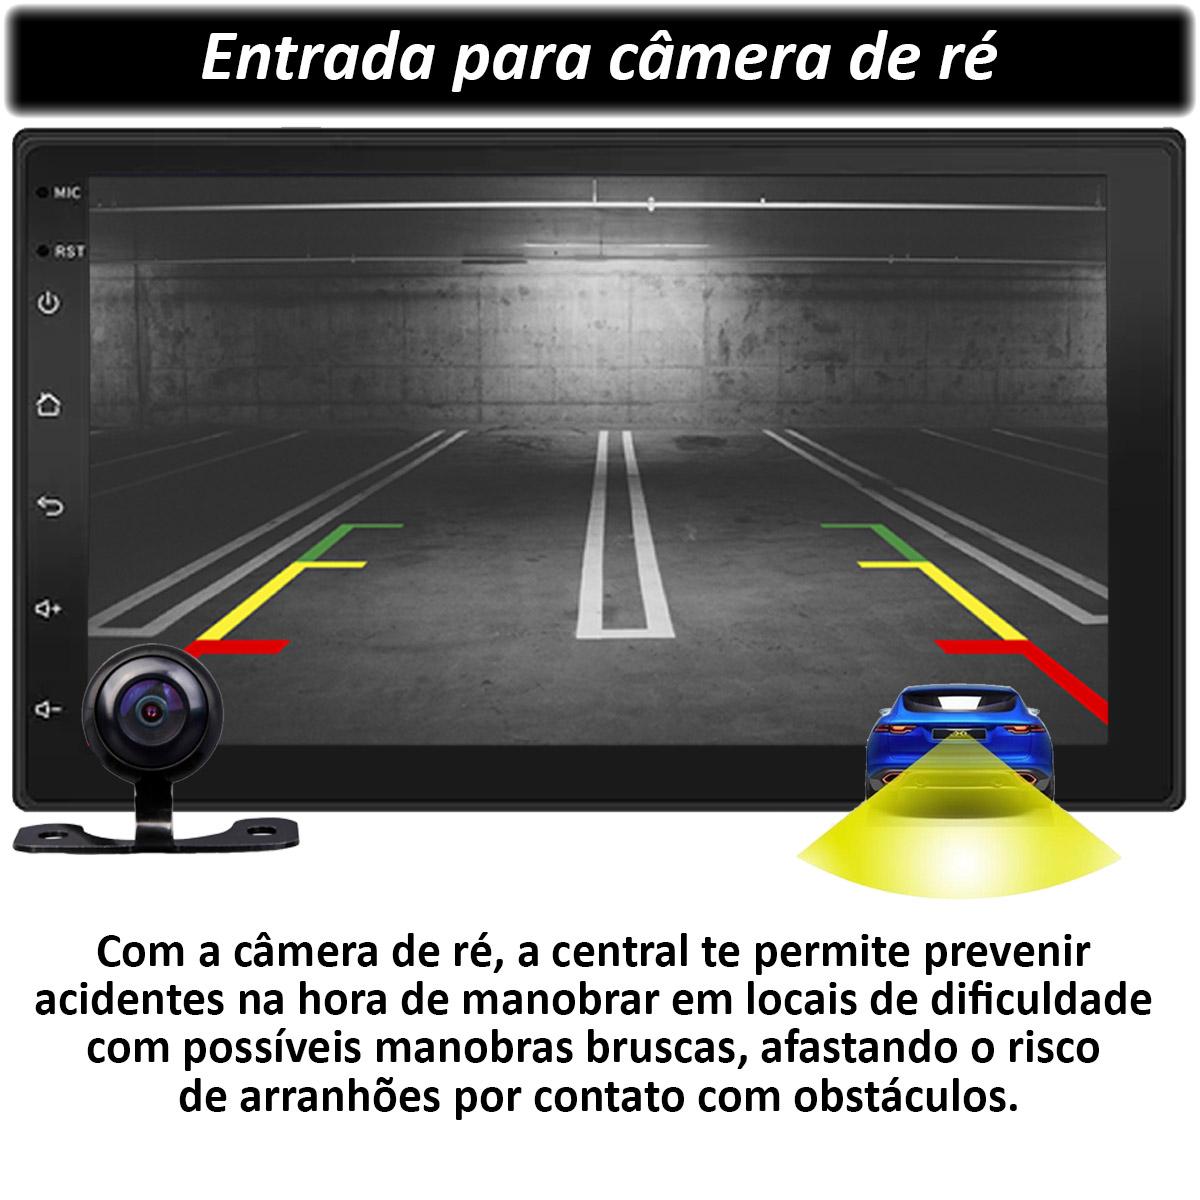 Central Multimídia Volkswagen Gol G5 Muzik Android com Câmera de Ré 7 Polegadas 2 Din Moldura Atacado Poliparts